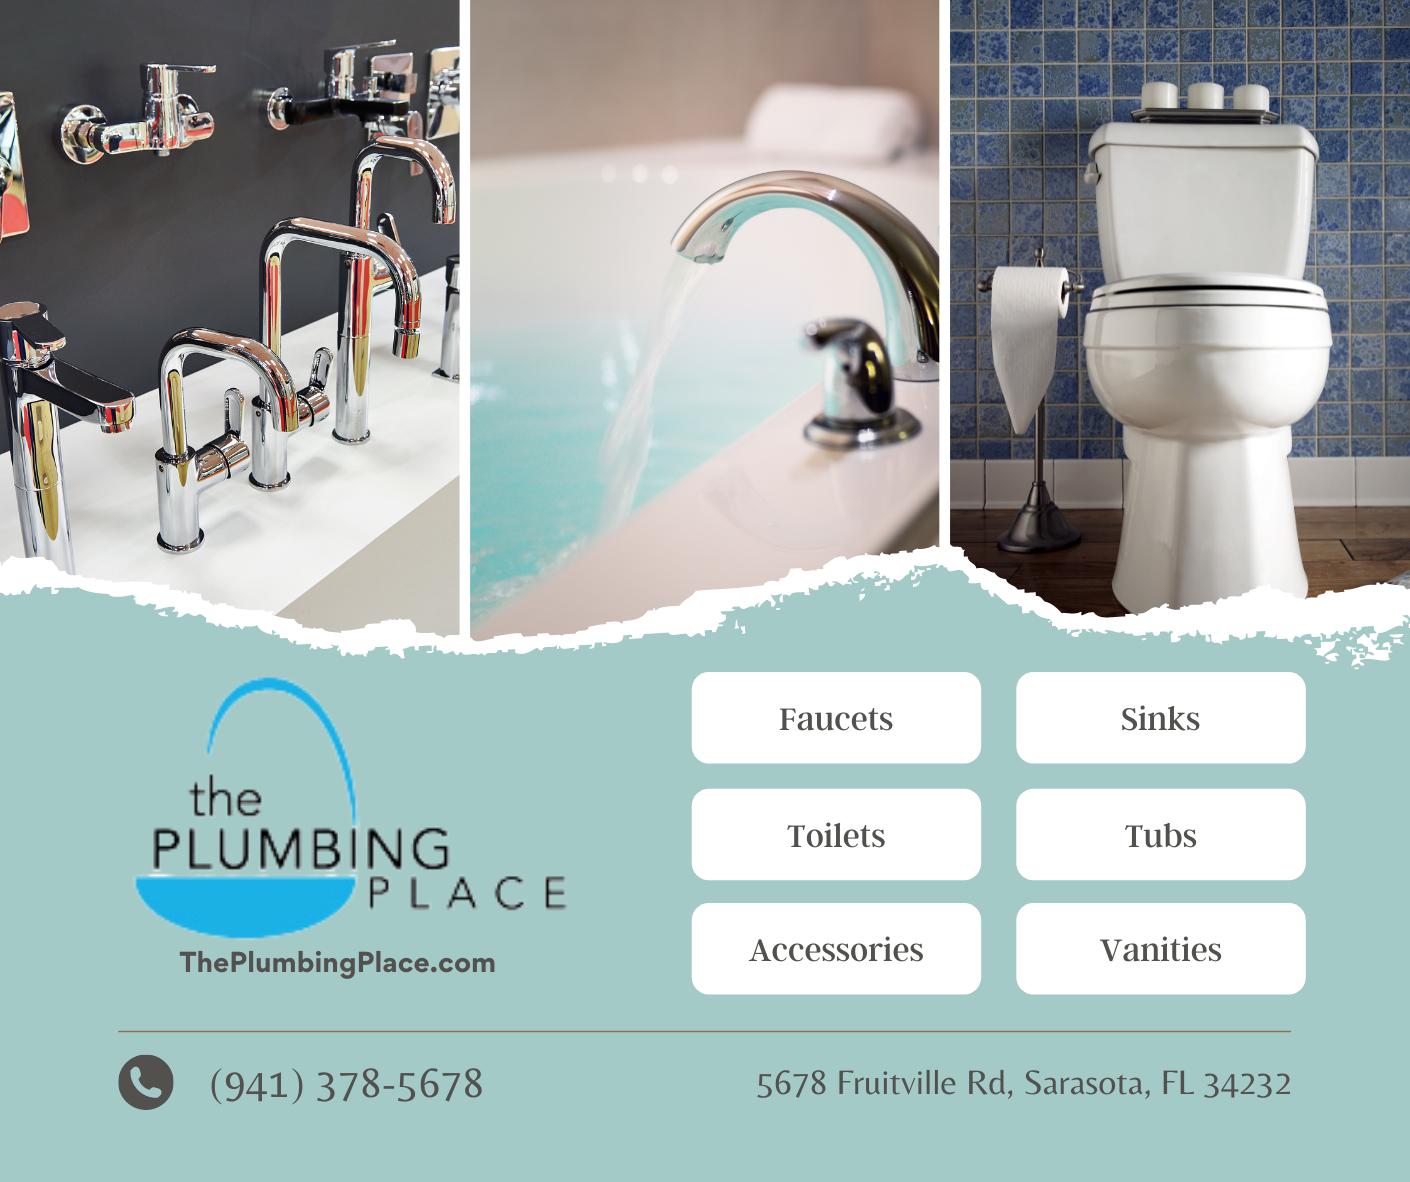 plumbing_place.png